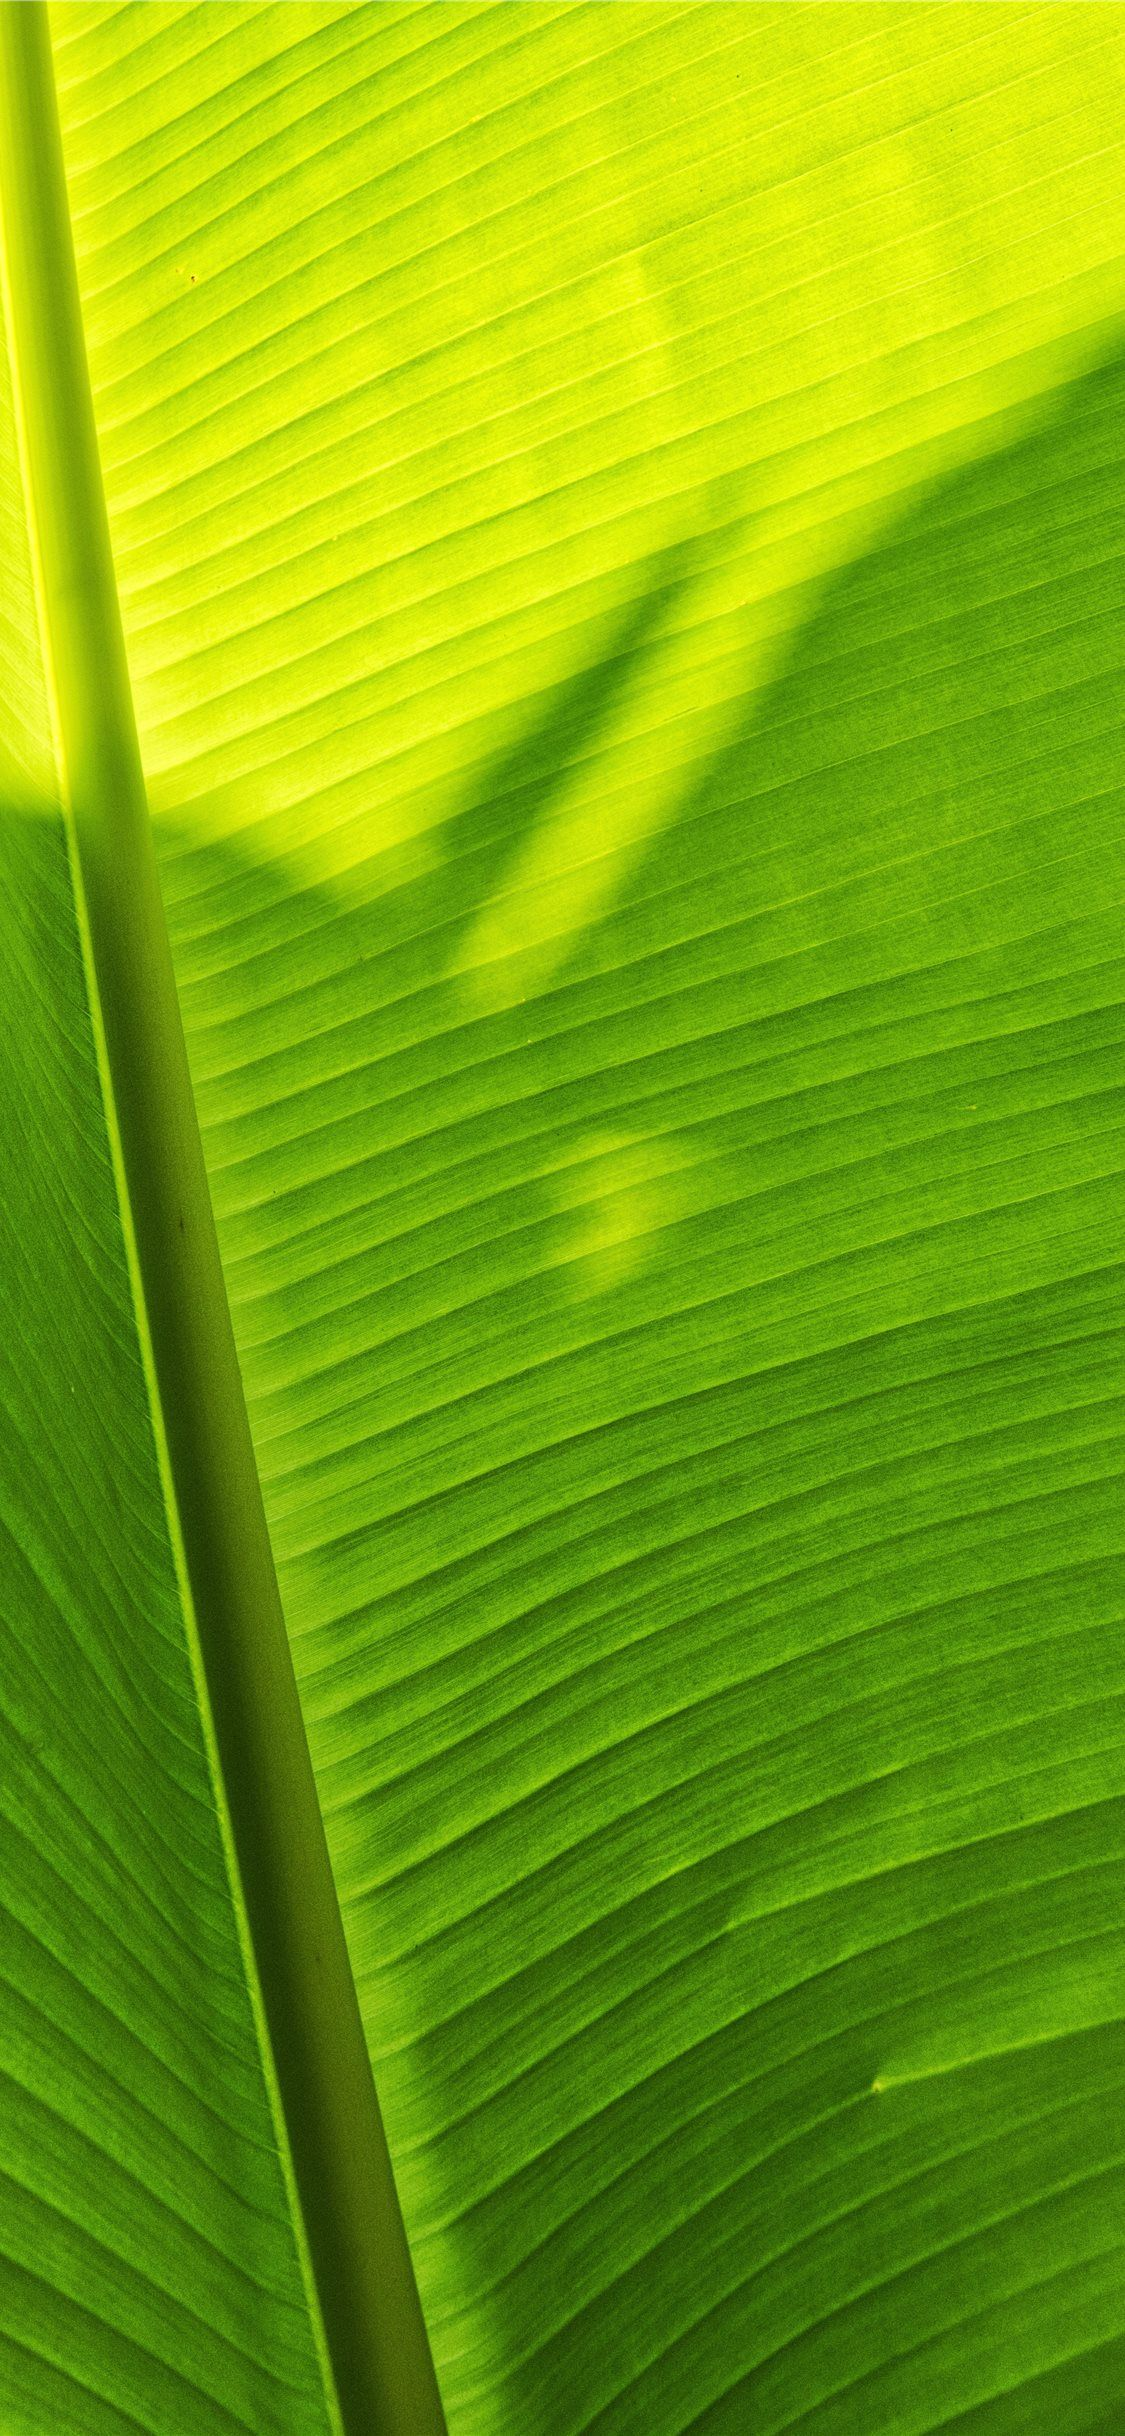 Banana Leaf Wallpapers - Wallpaper Cave